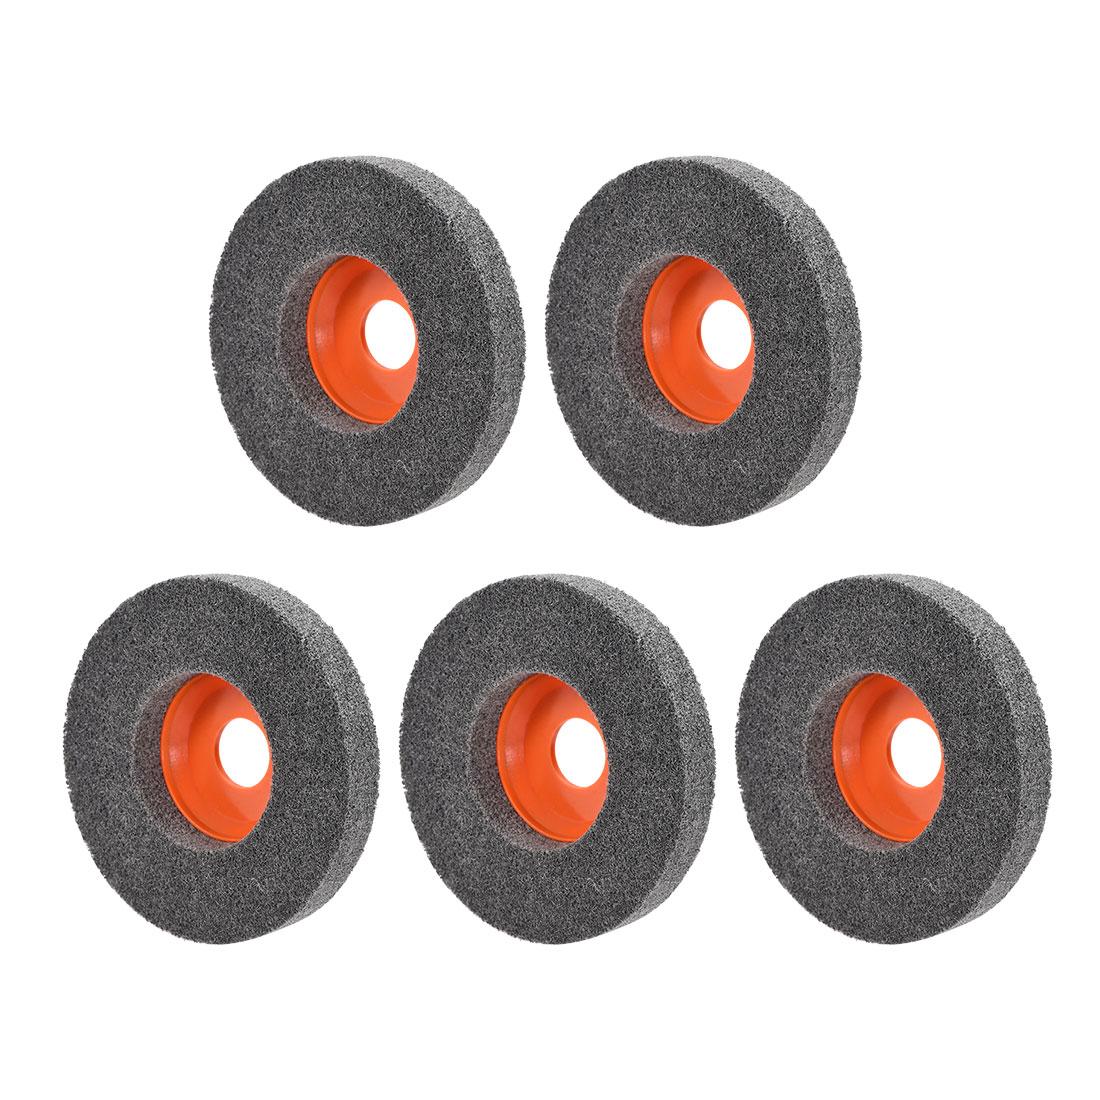 4.5 Inch Polishing Wheel Buffing Pad Disc for 100 Angle Grinders Orange 5pcs